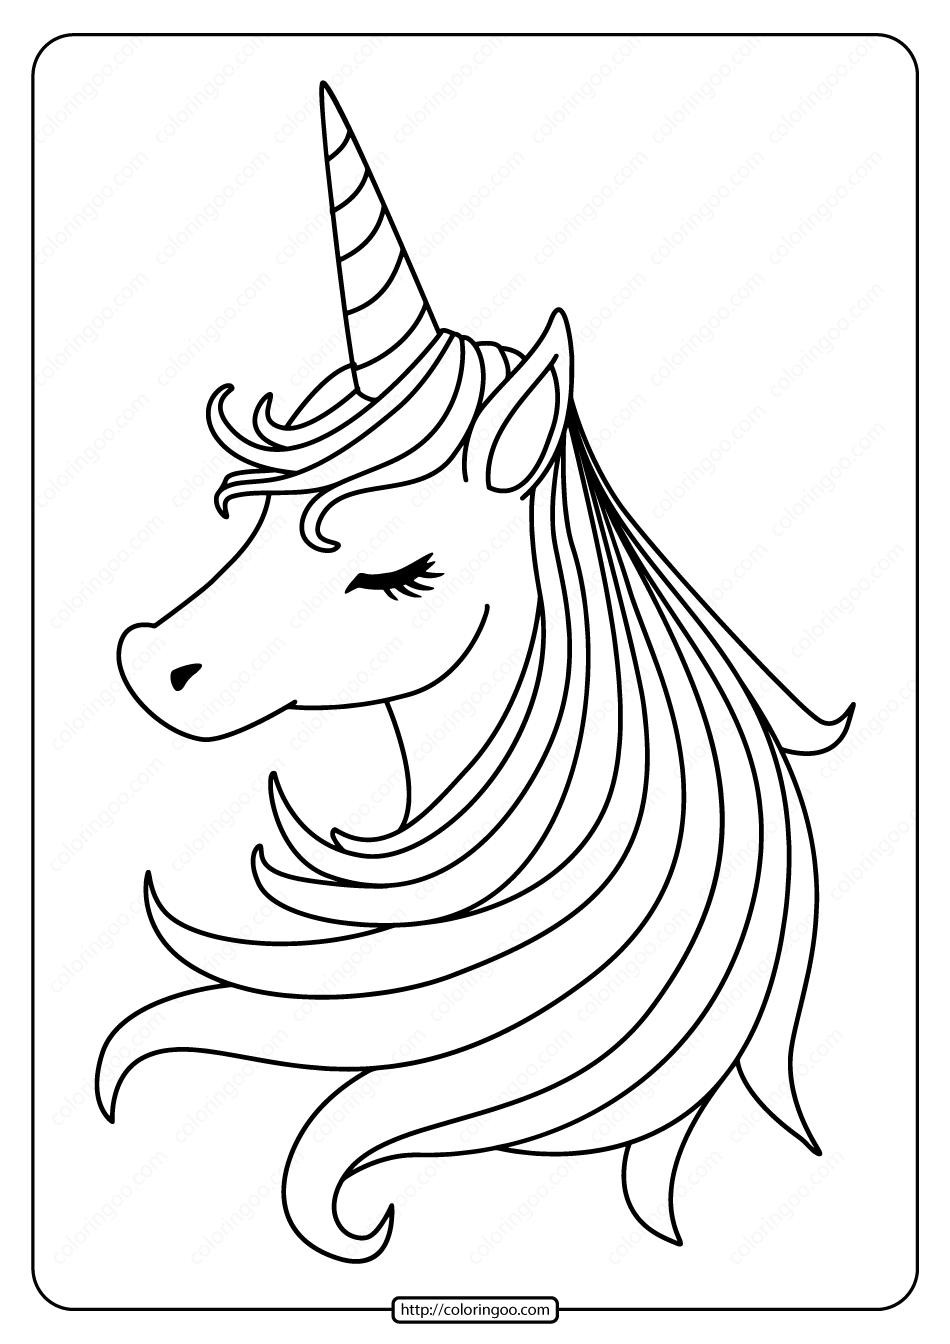 Free Printable Sleeping Unicorn Pdf Coloring Page. High quality